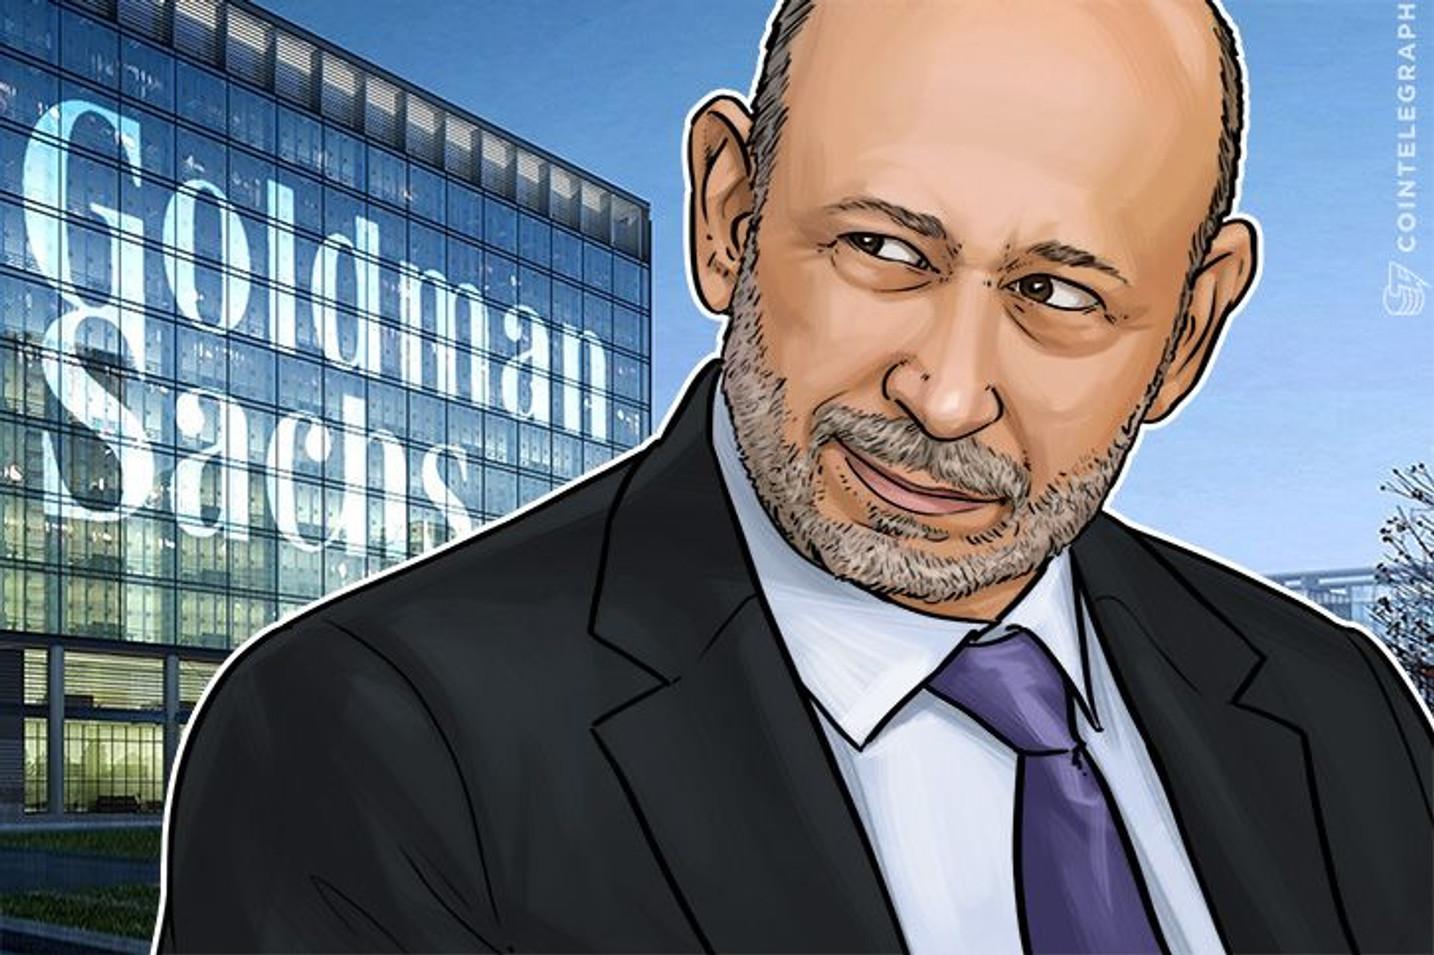 La directora de Inversiones de Goldman Sachs: El estallido de la burbuja de cripto afectará al 1% del PIB mundial